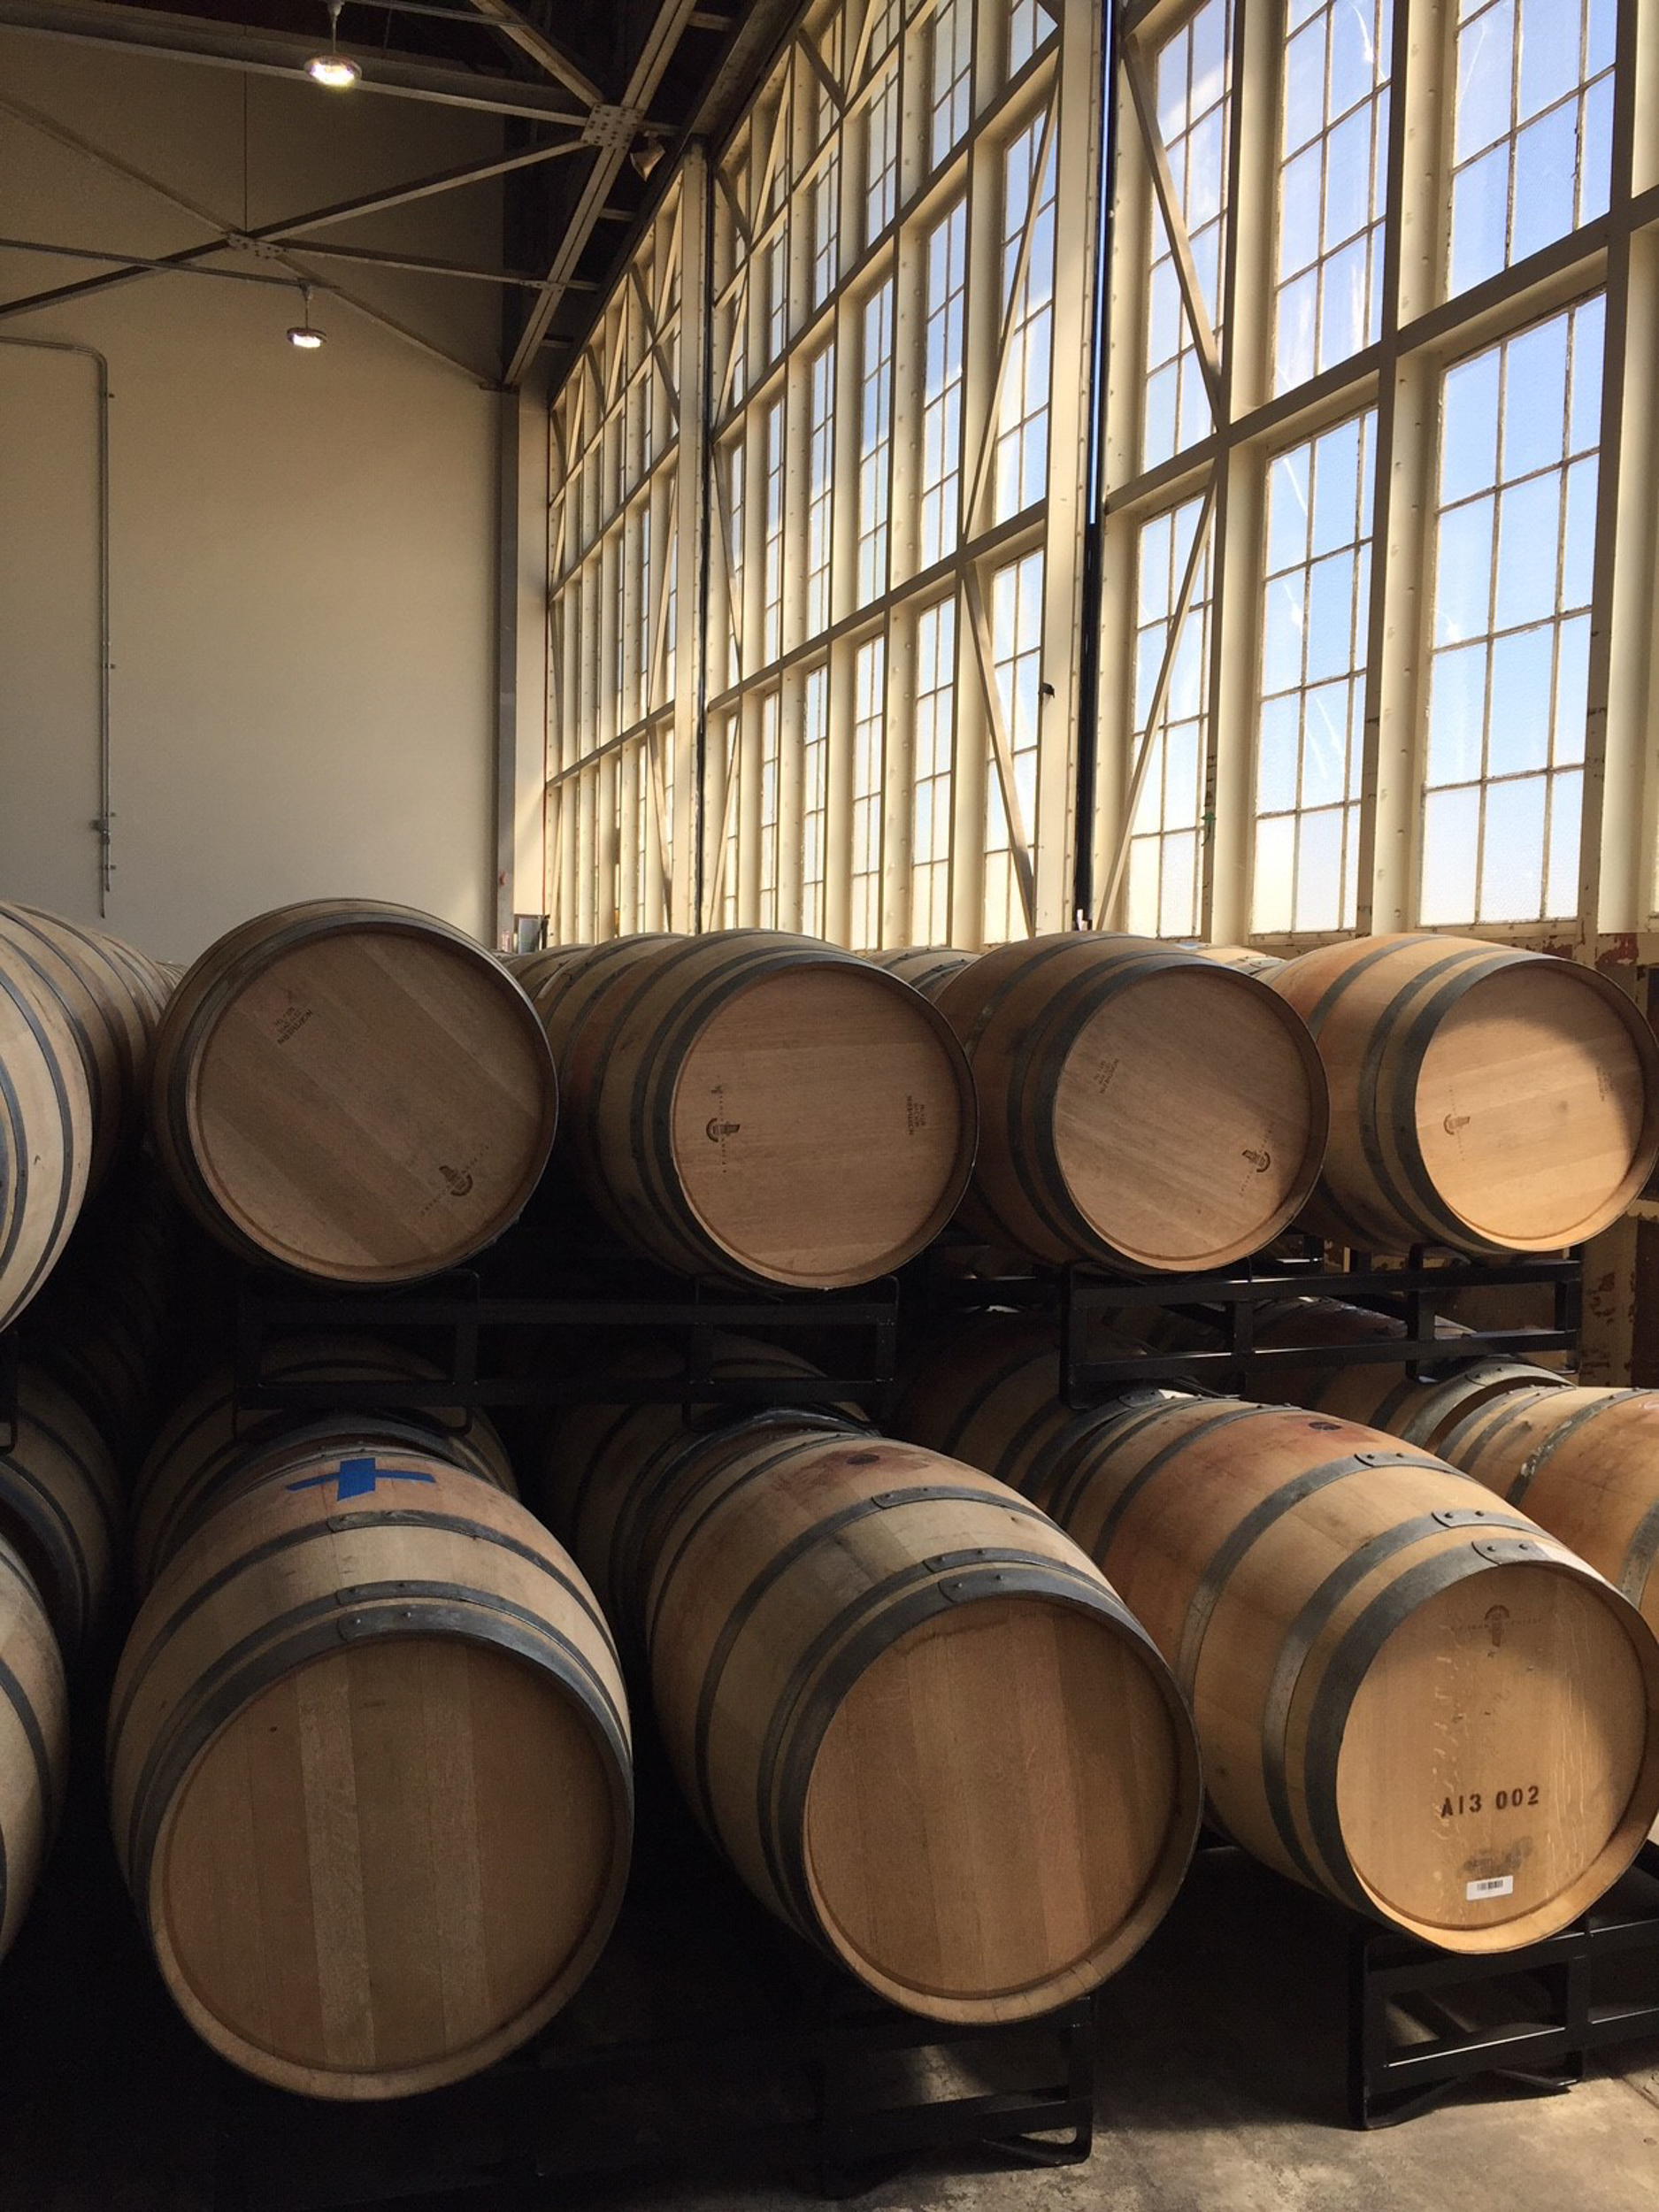 Oak barrels stacked at Hangar 1 Distillery